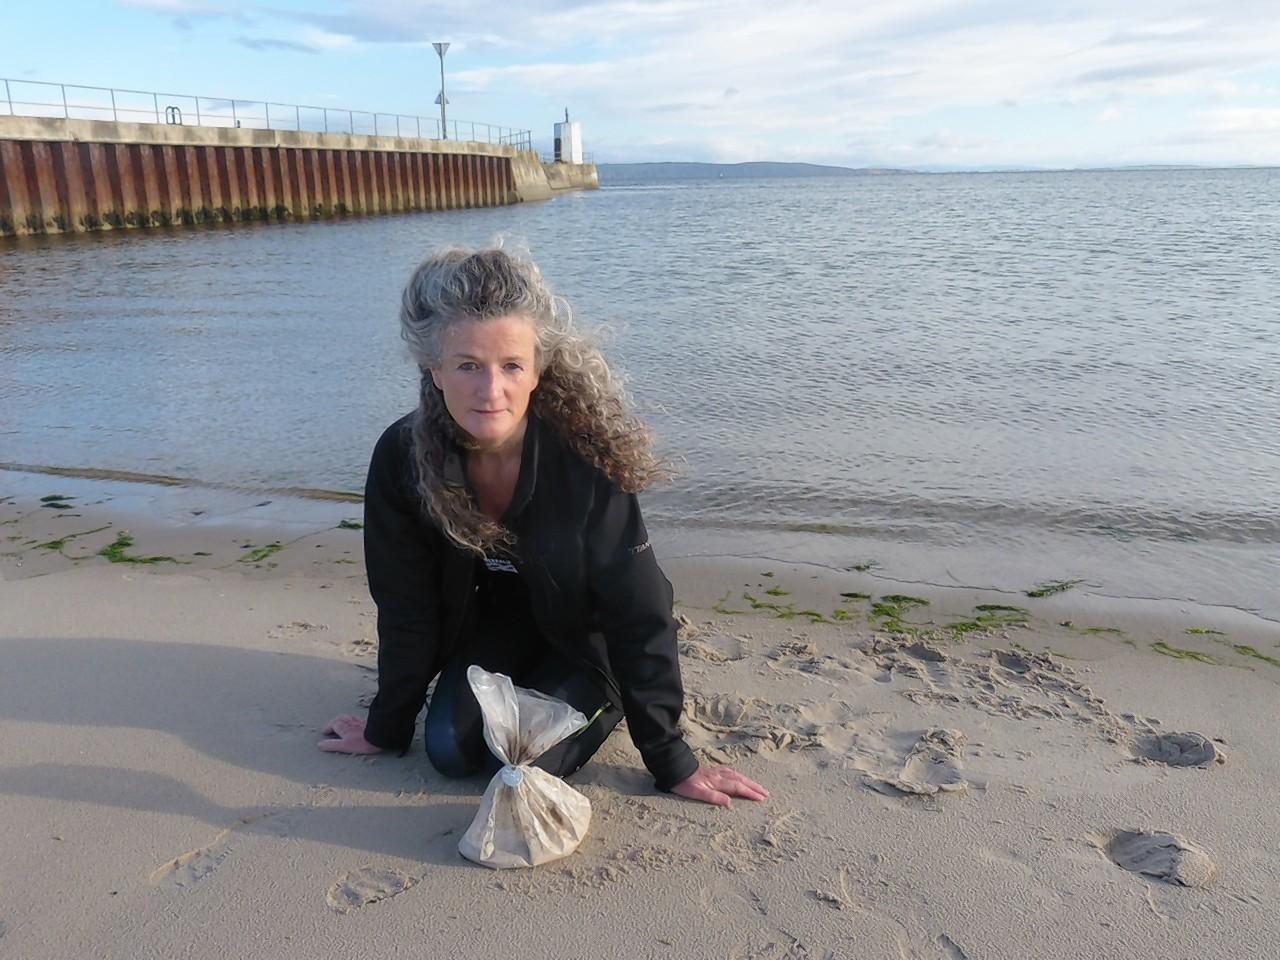 Morag Paterson found  the human ashes on the beach near Nairn